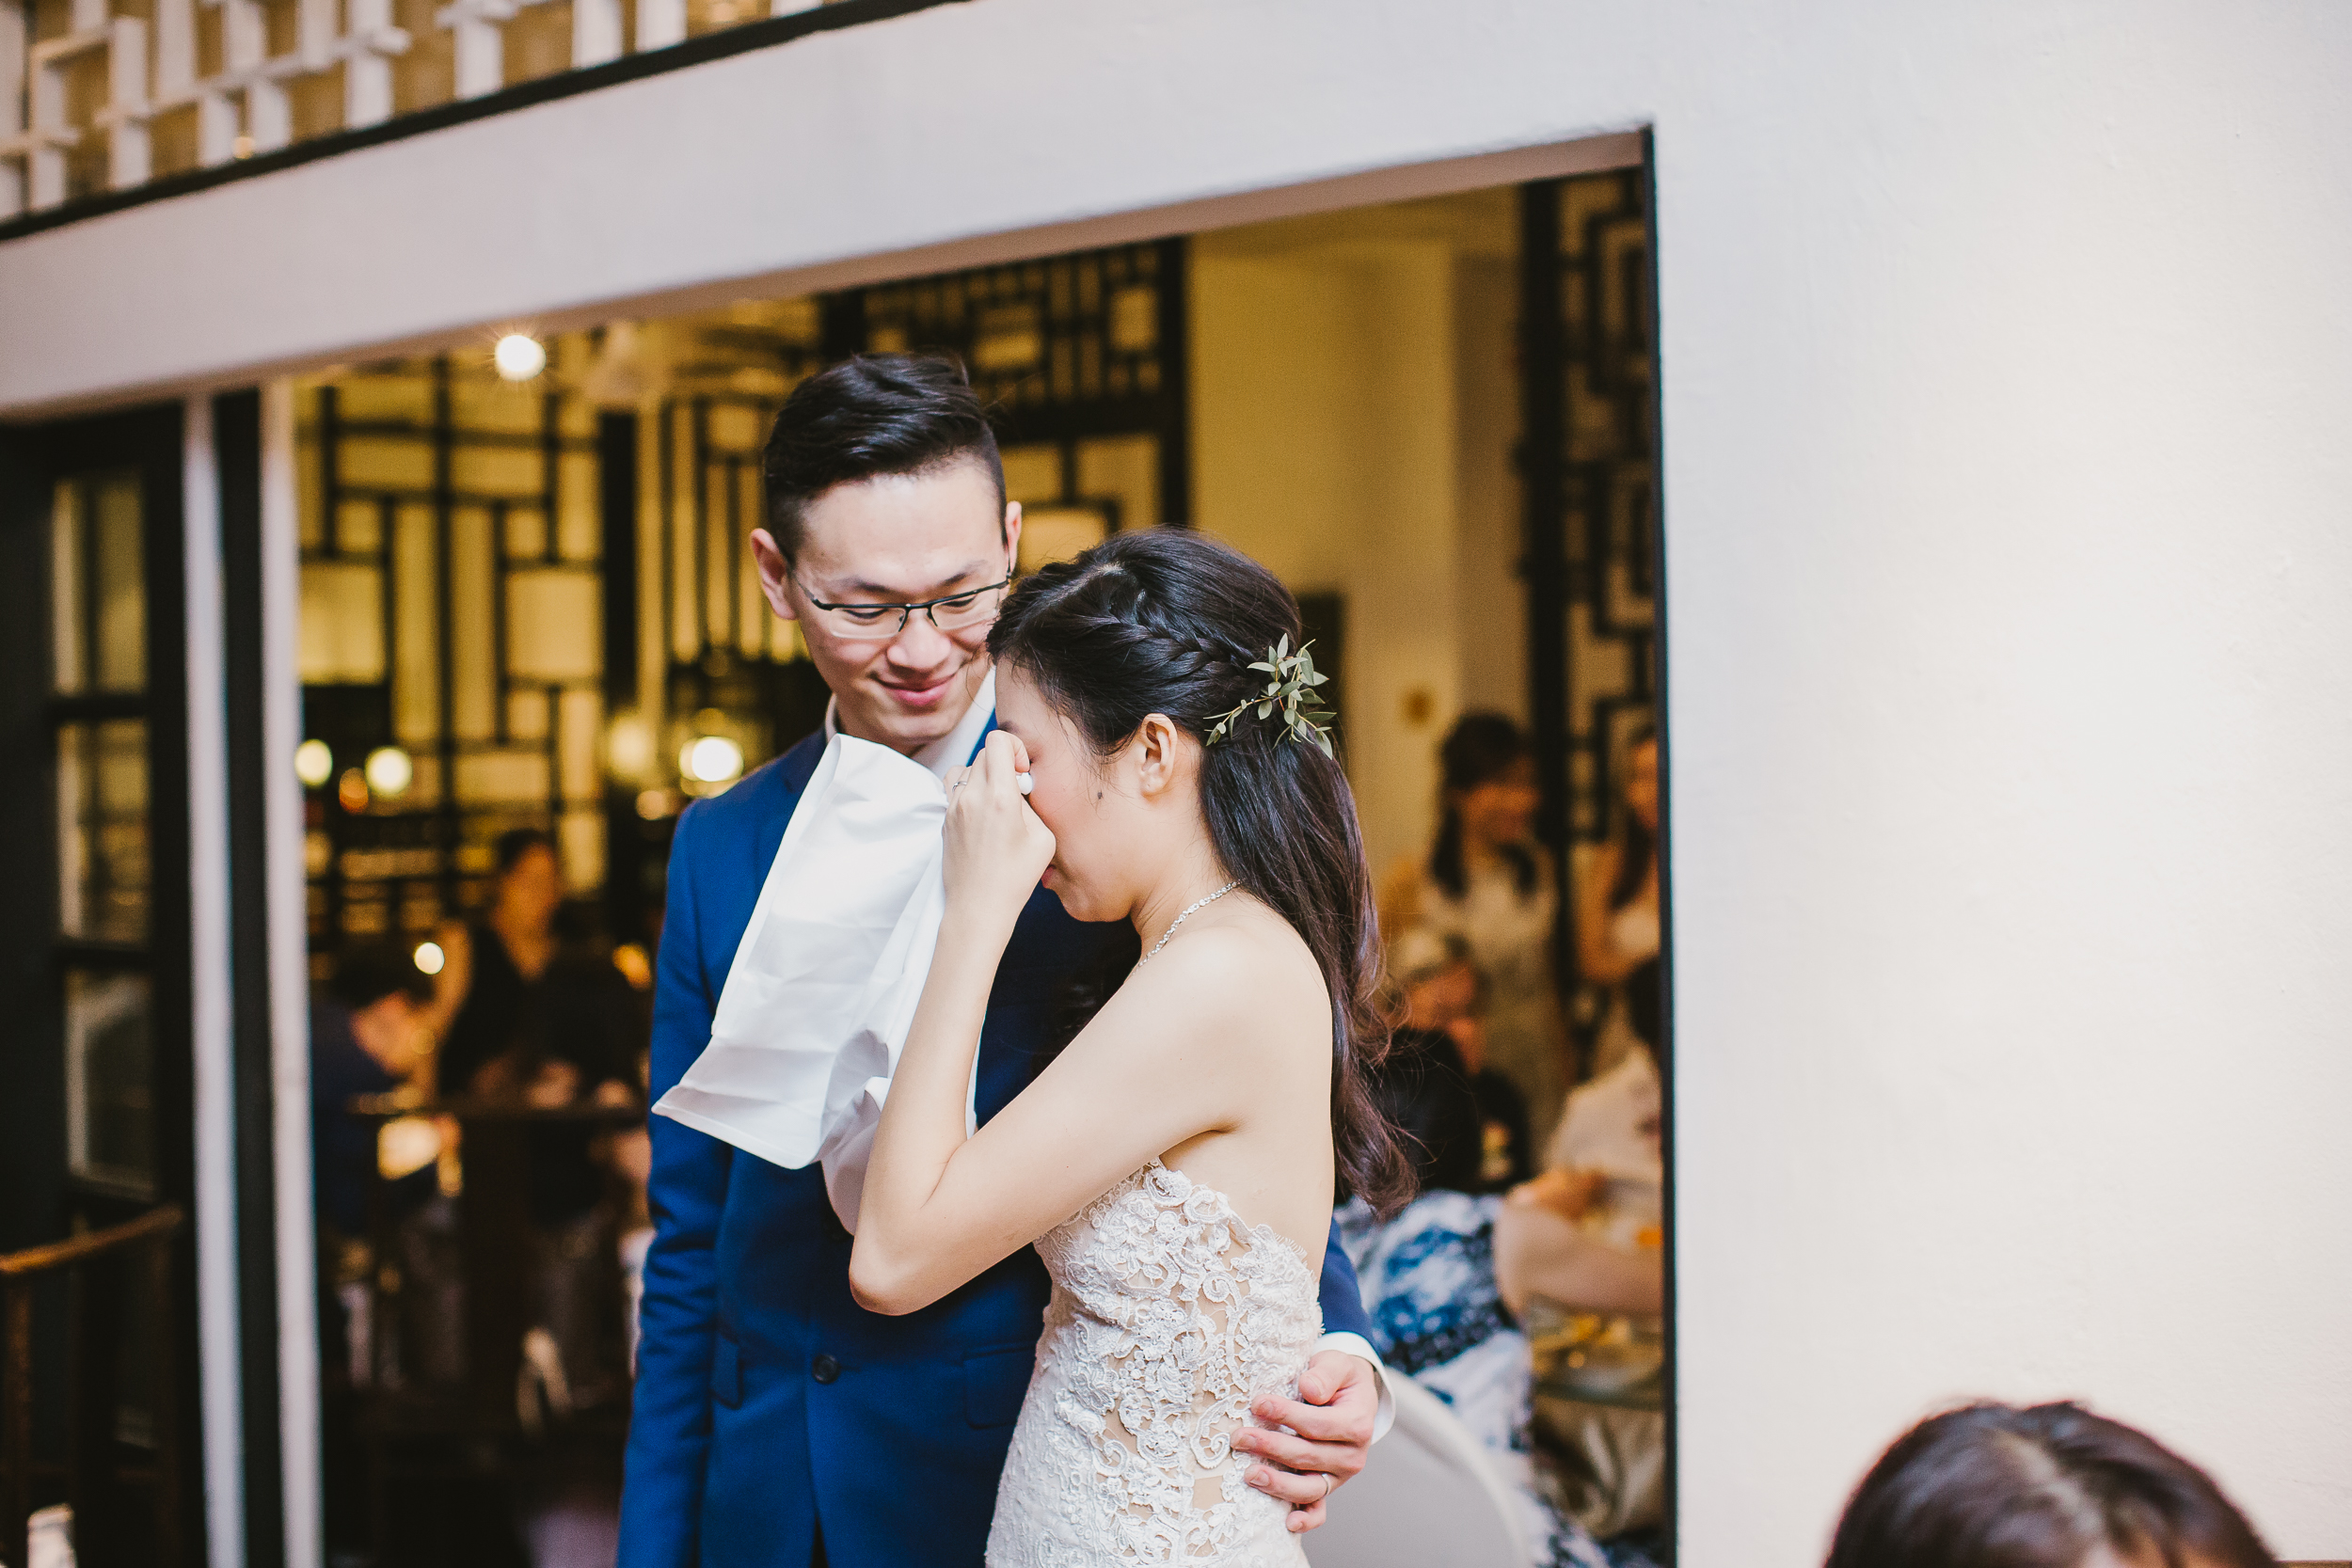 Singapore+Actual+Day+Wedding+Photographer+Min+Jiang+Rochester+Gareth+Faith--0075.jpg